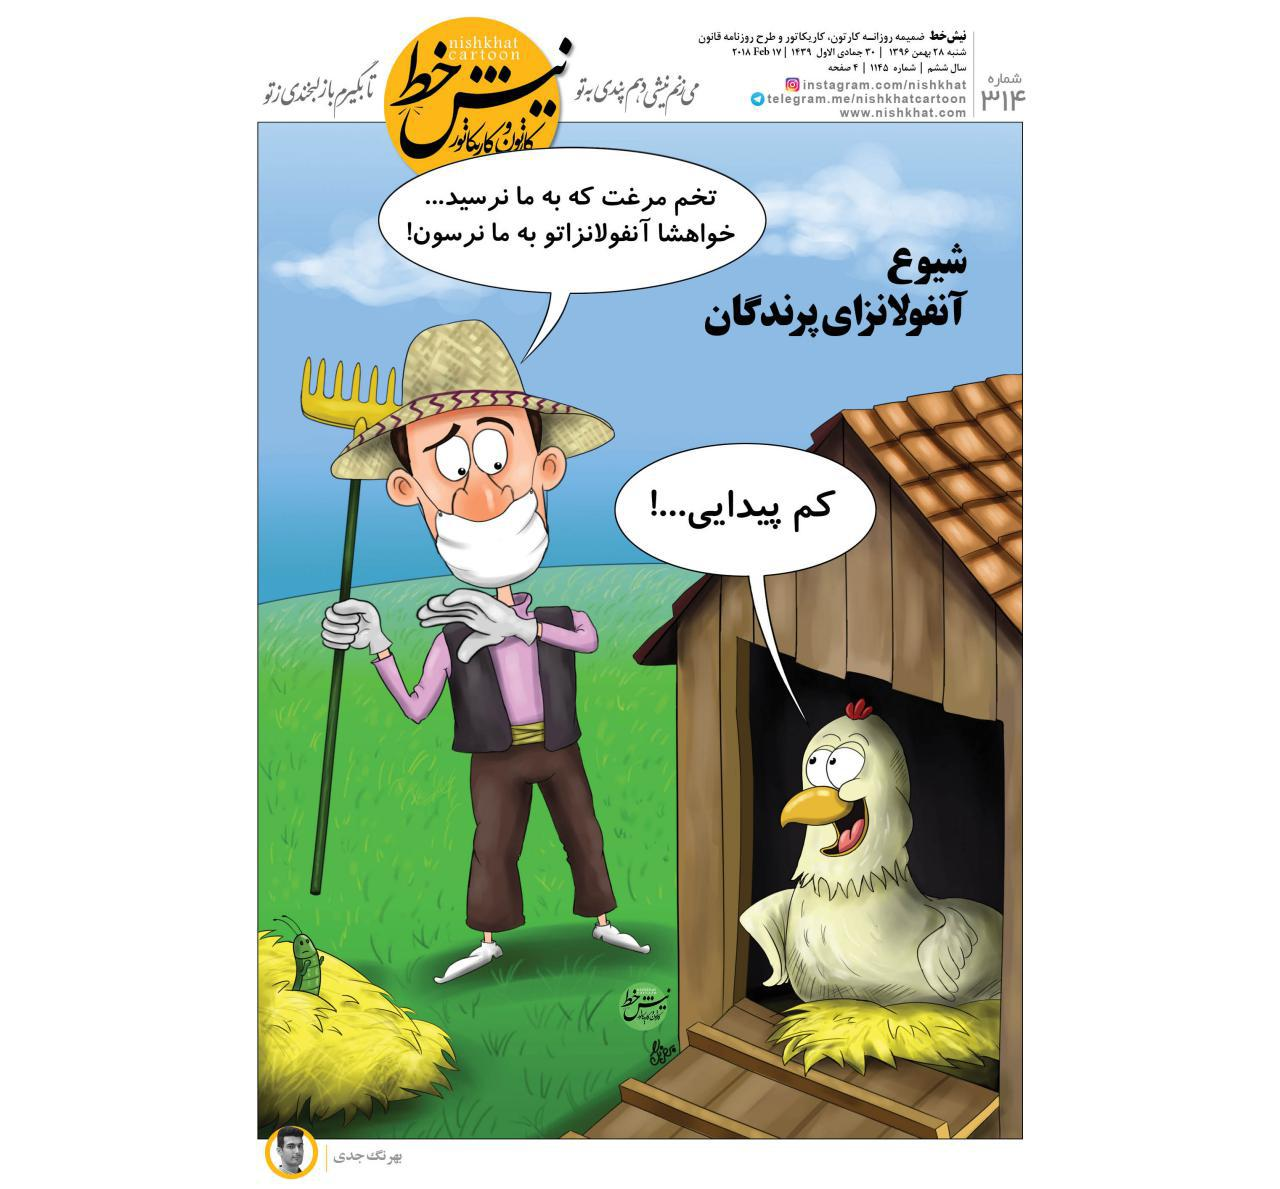 نیشخط کارتون / شیوع آنفولانزای مرغی